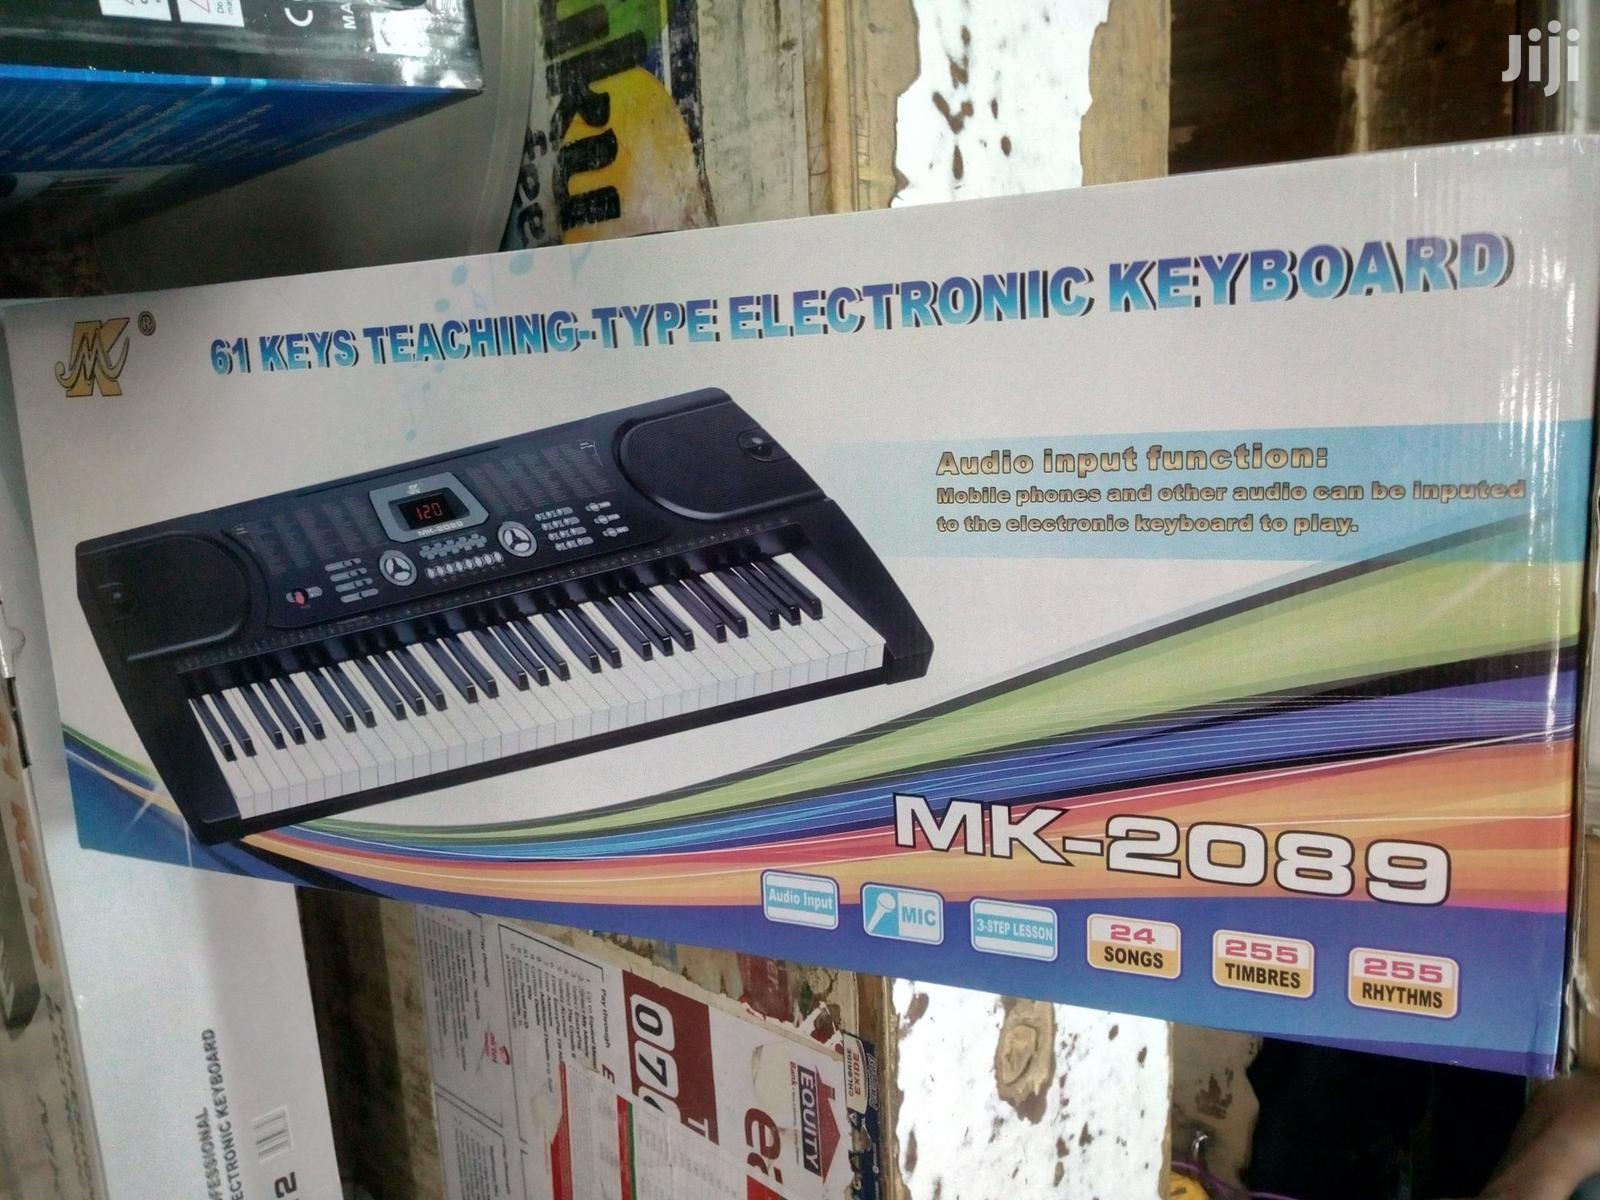 Teaching Keyboard 61 Keys | Musical Instruments & Gear for sale in Nairobi Central, Nairobi, Kenya